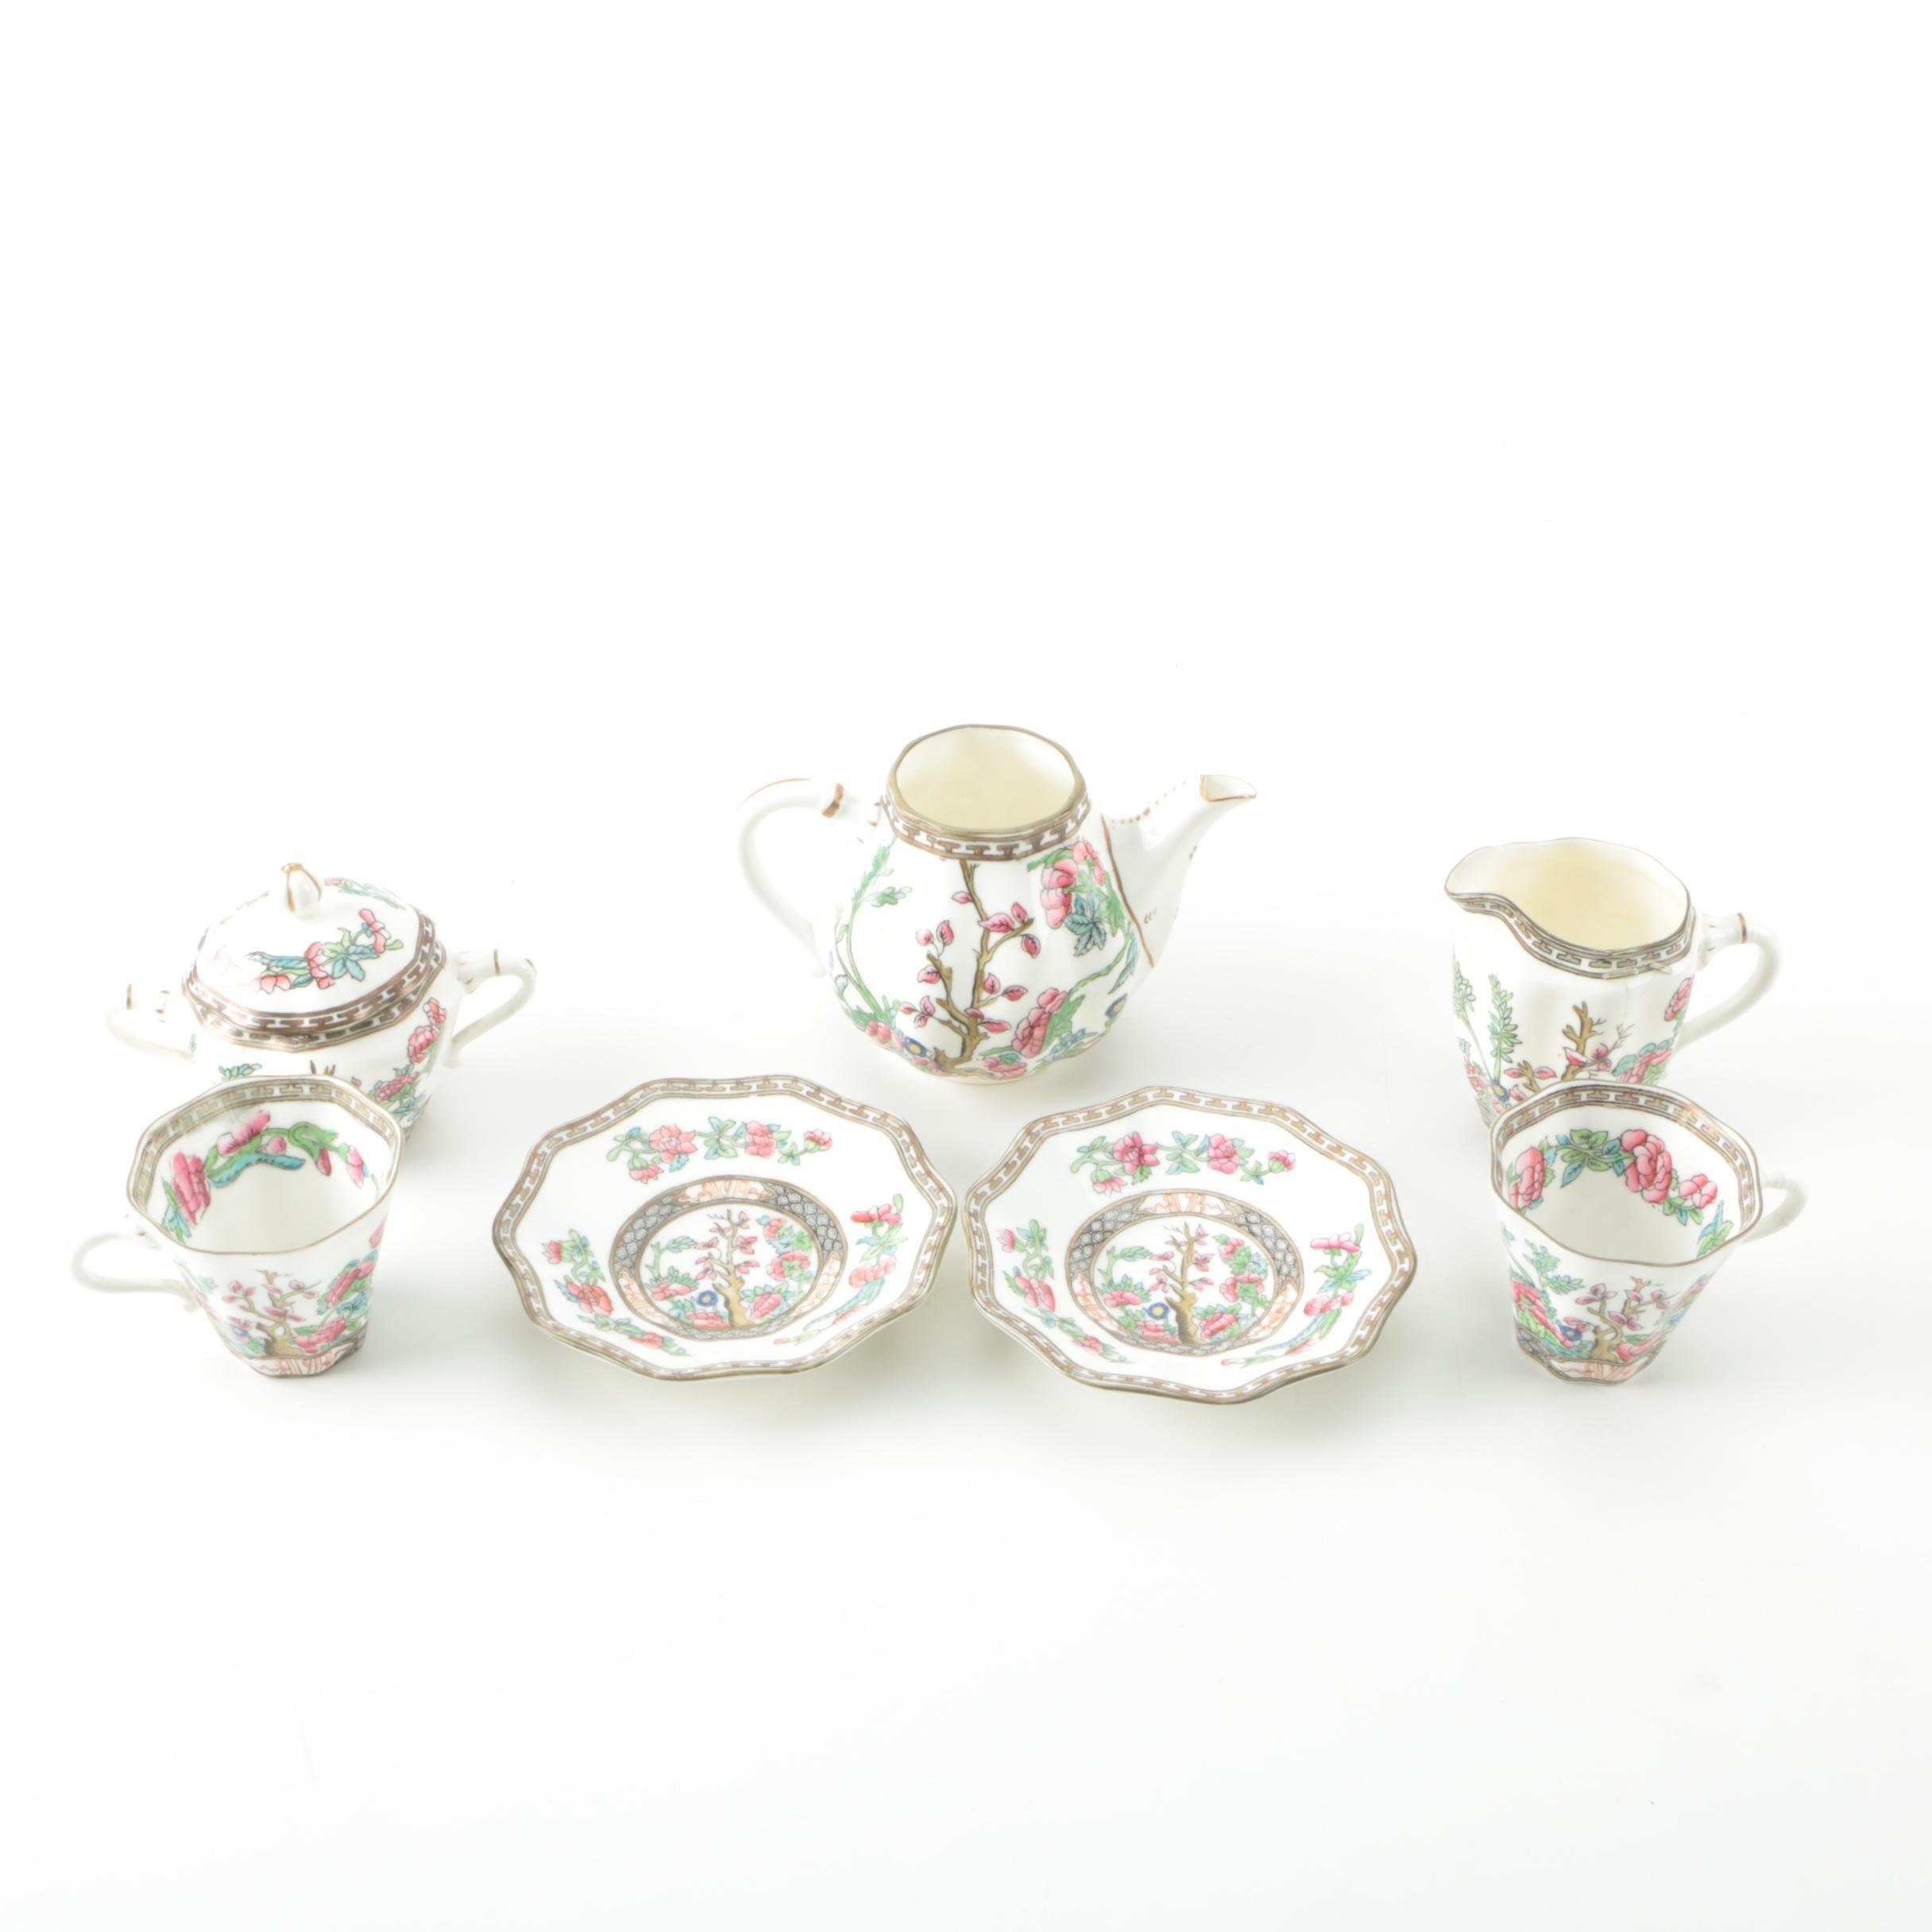 "Early 20th Century Coalport ""Indian Tree"" Porcelain Tea Service"